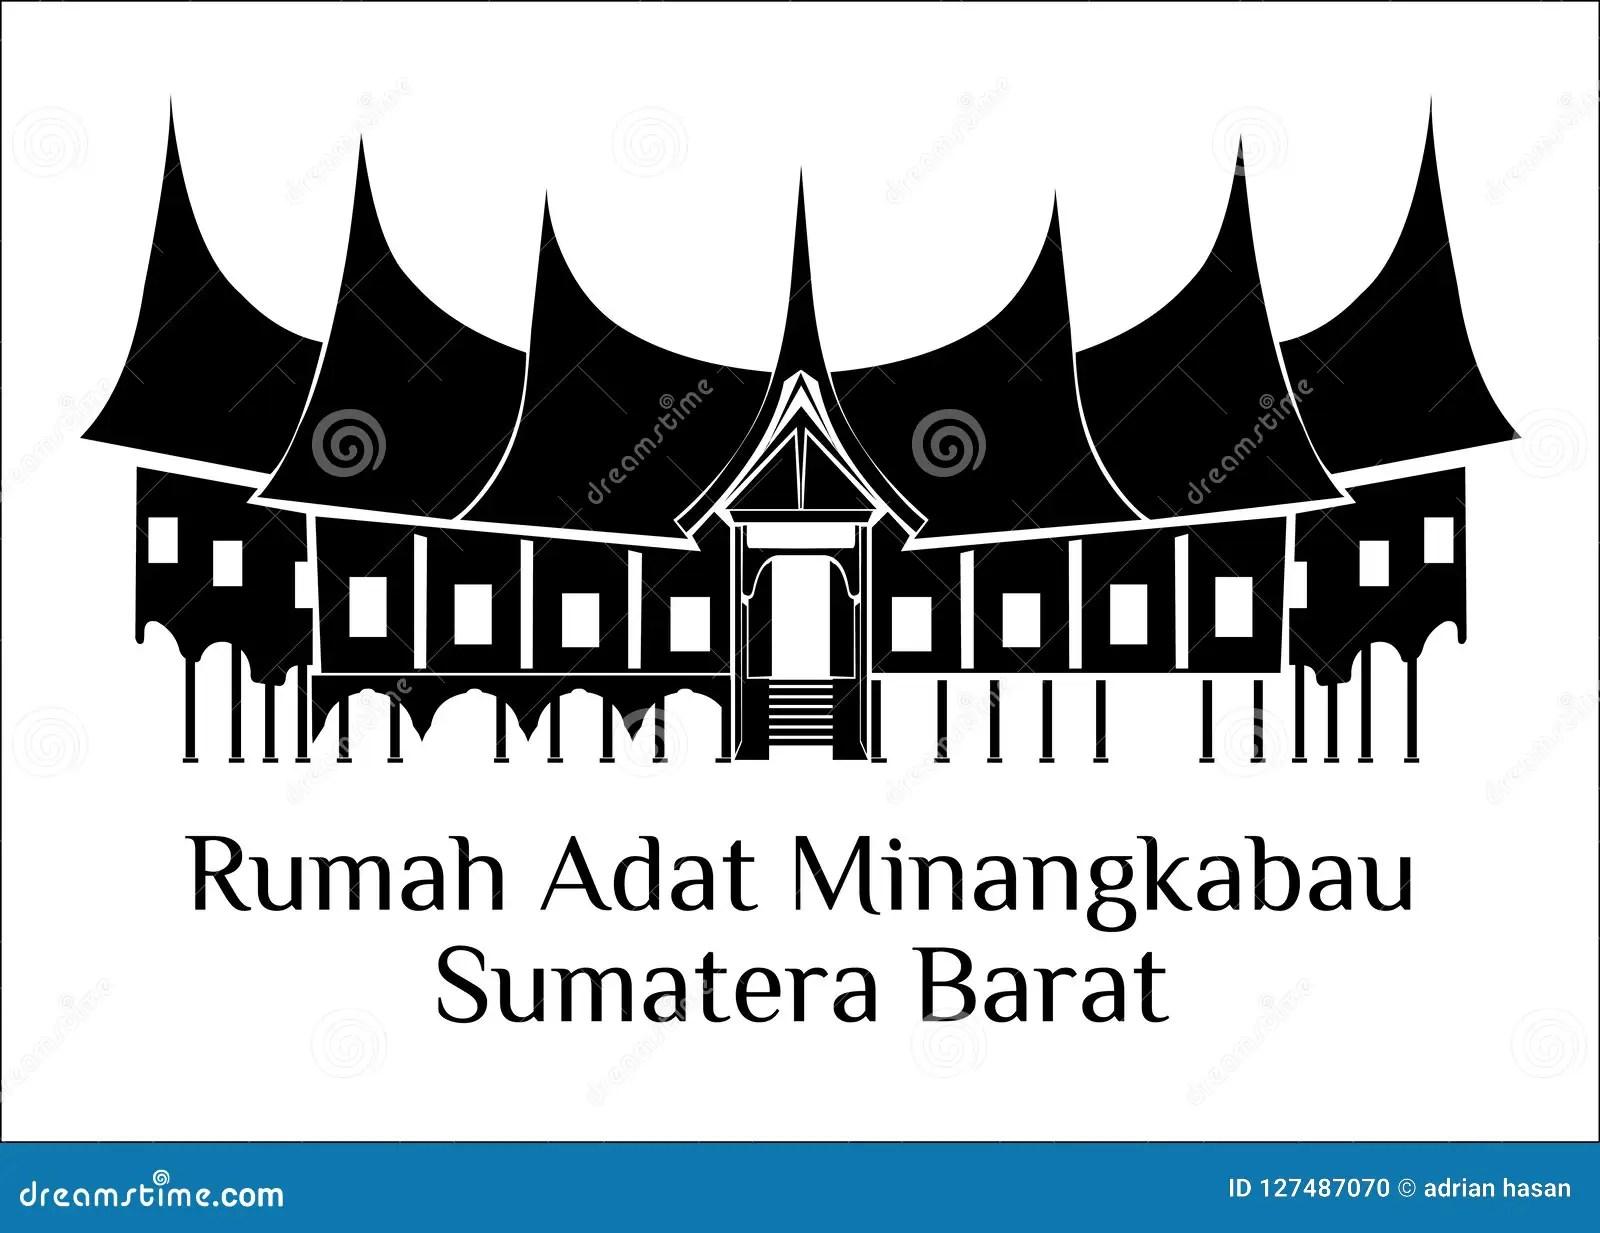 Rumah Adat Minangkabau Sumatra Barat Stock Illustration